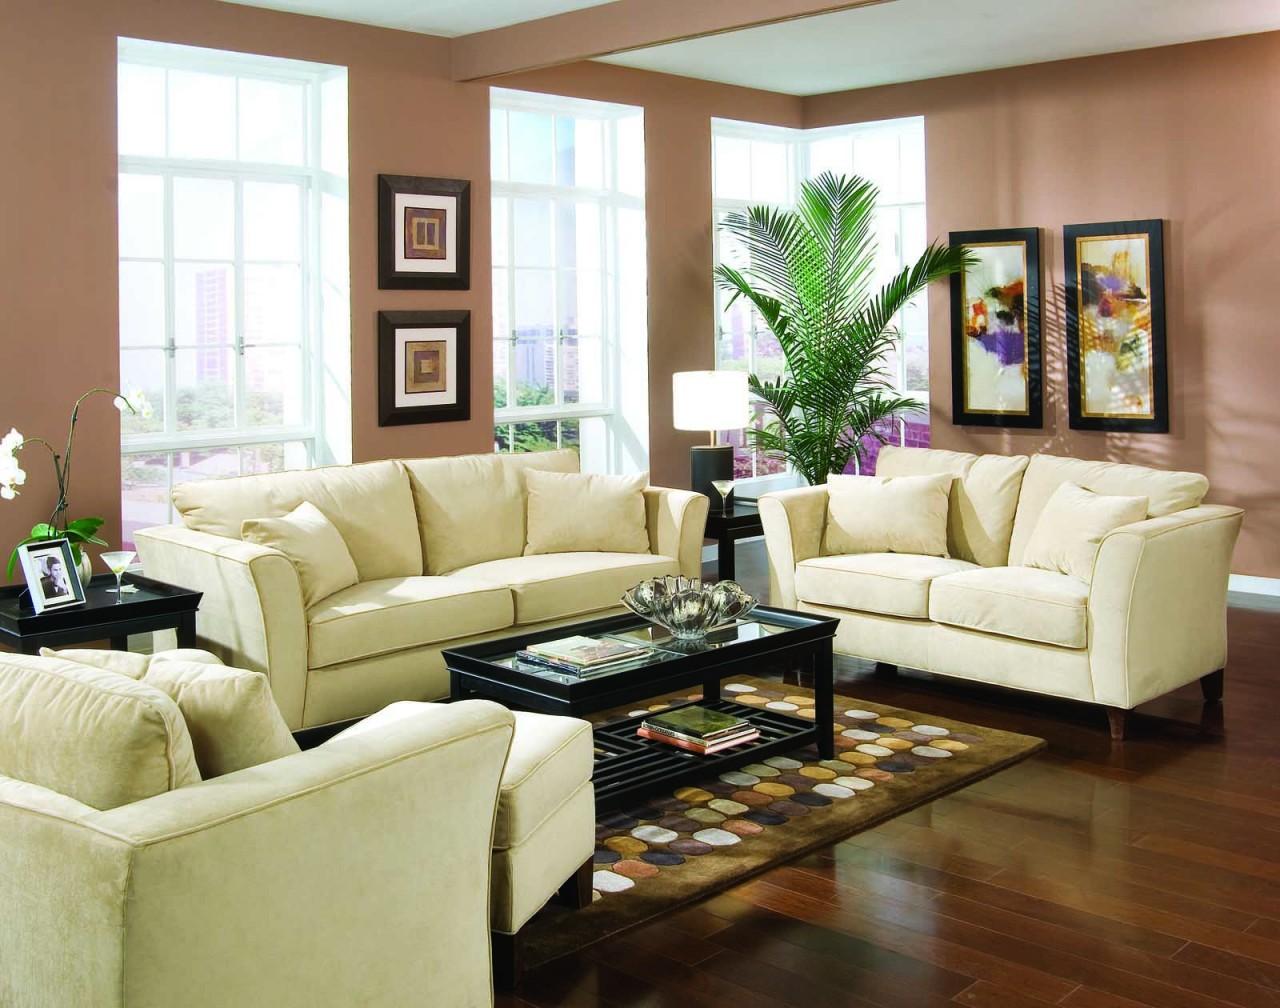 feng shui bedroom items popular interior house ideas. Black Bedroom Furniture Sets. Home Design Ideas